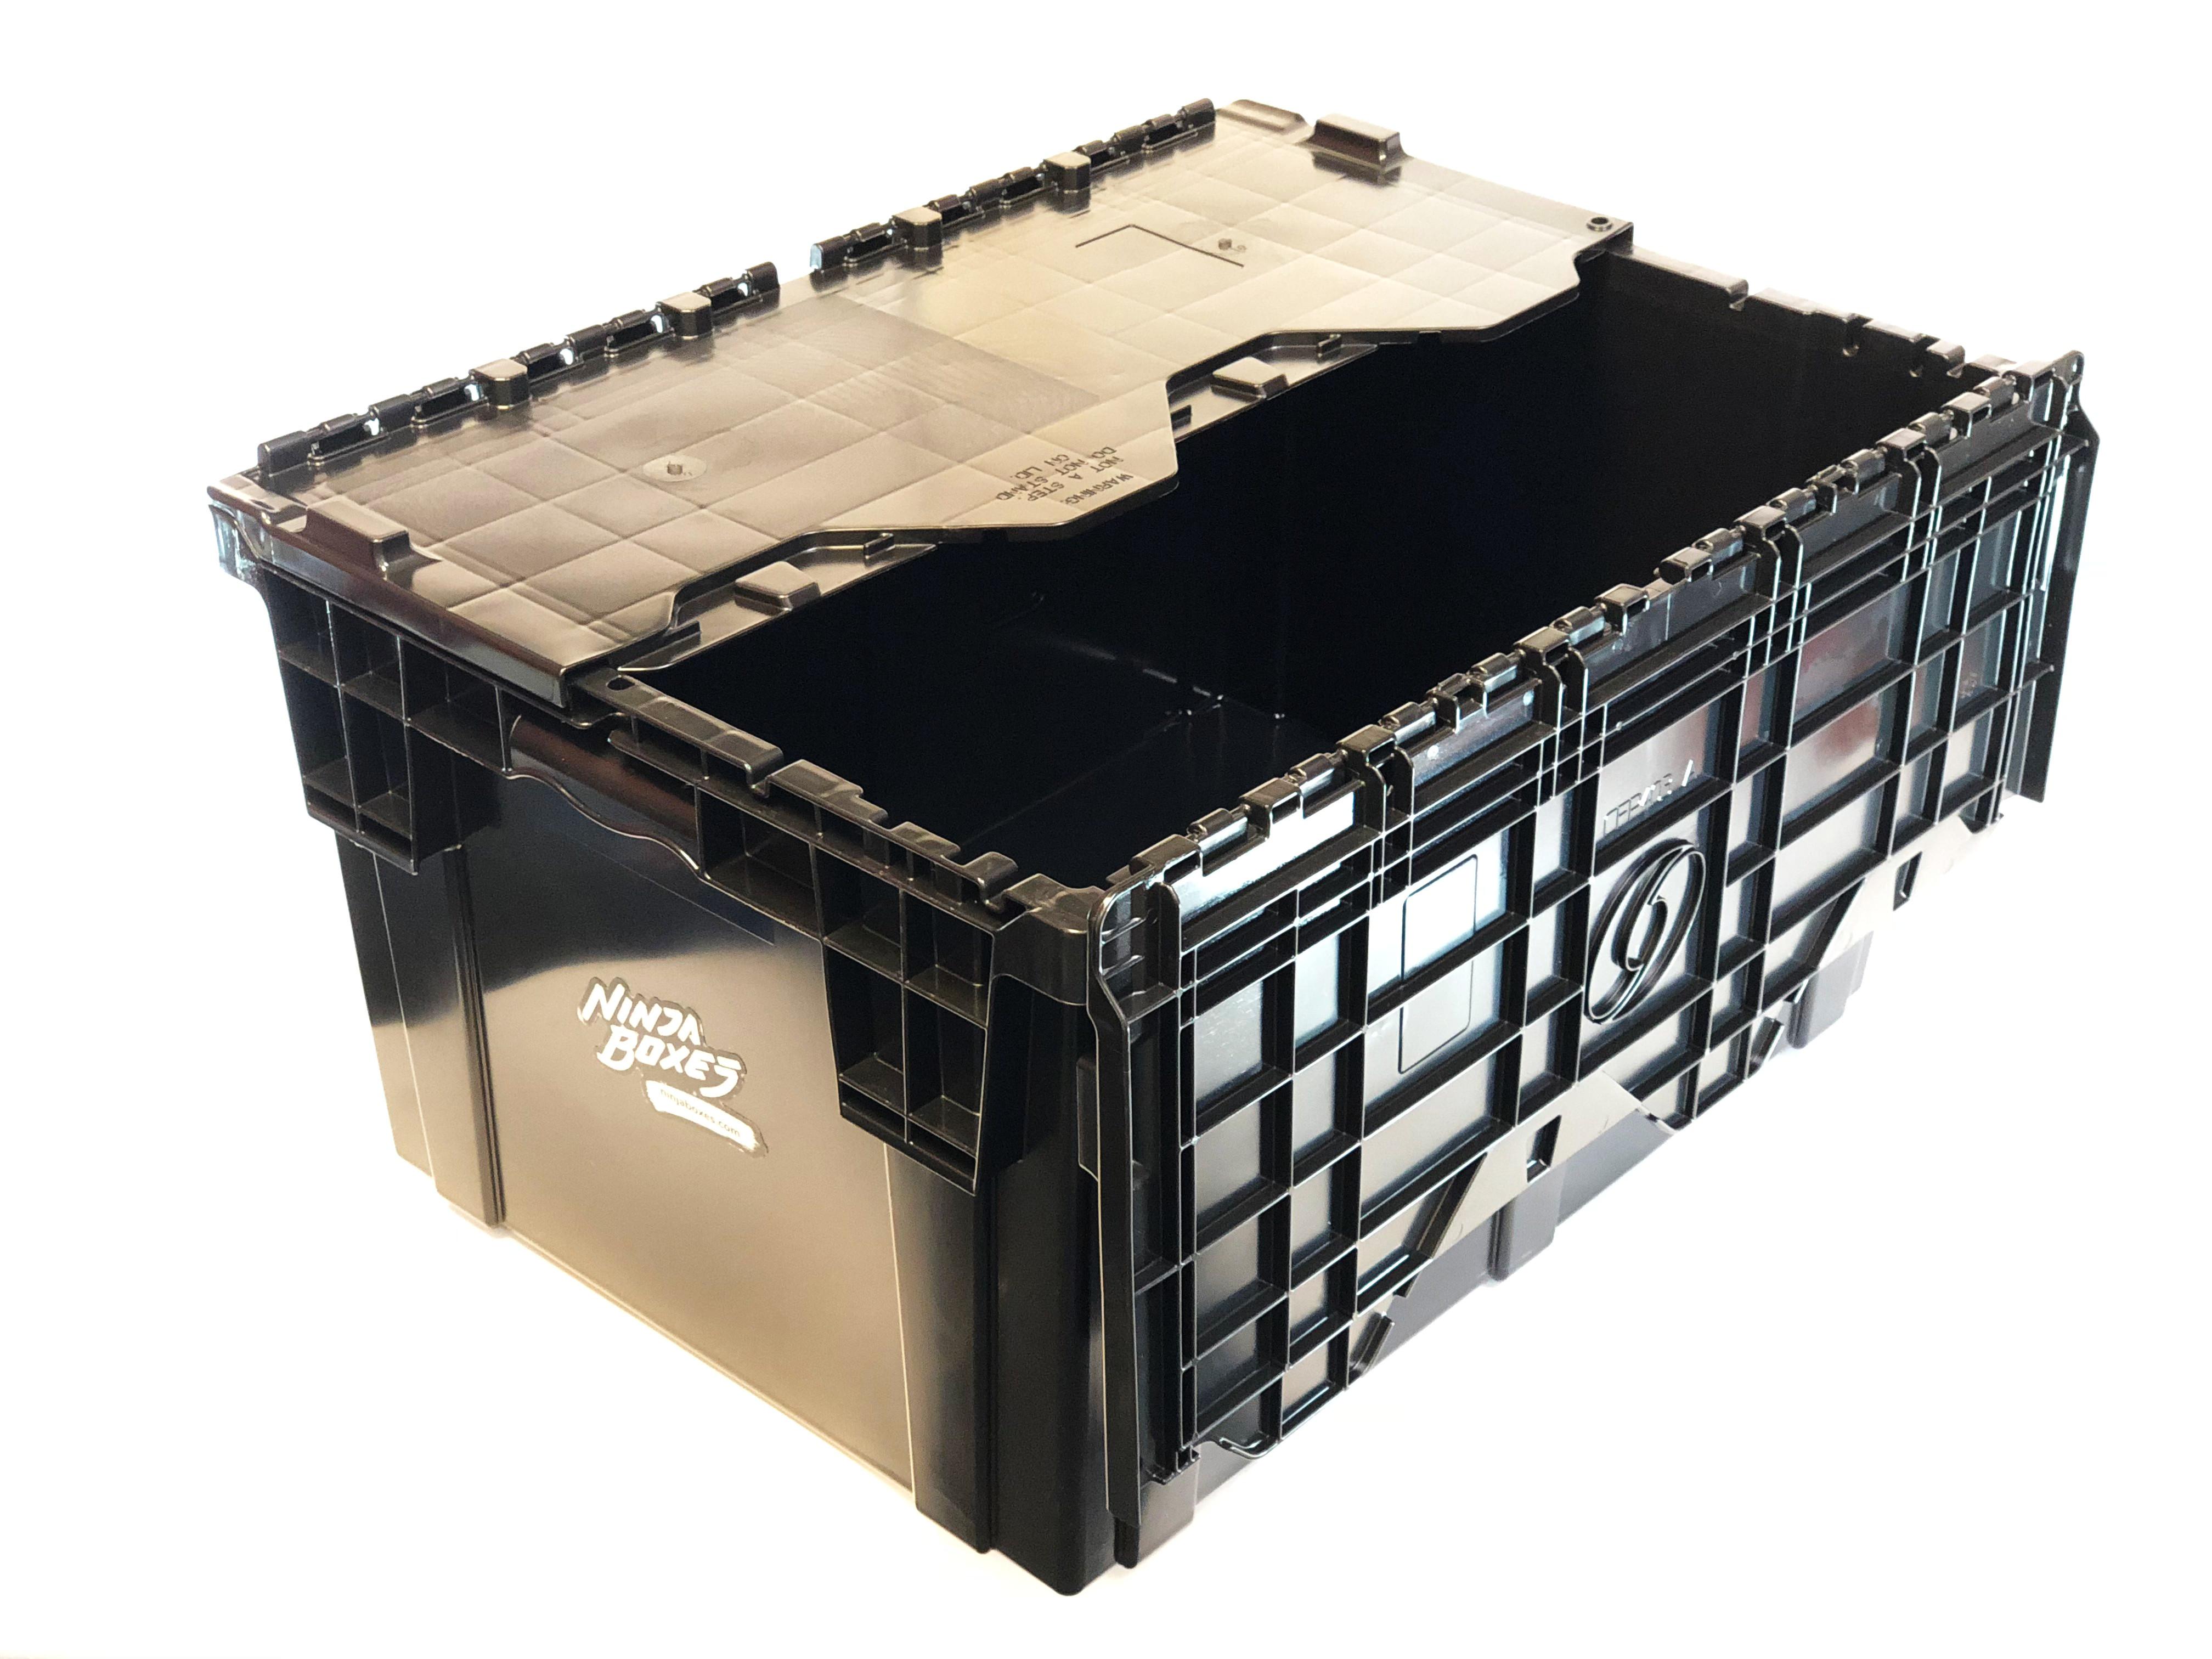 Ninja Boxes Santa Ana California movers directory